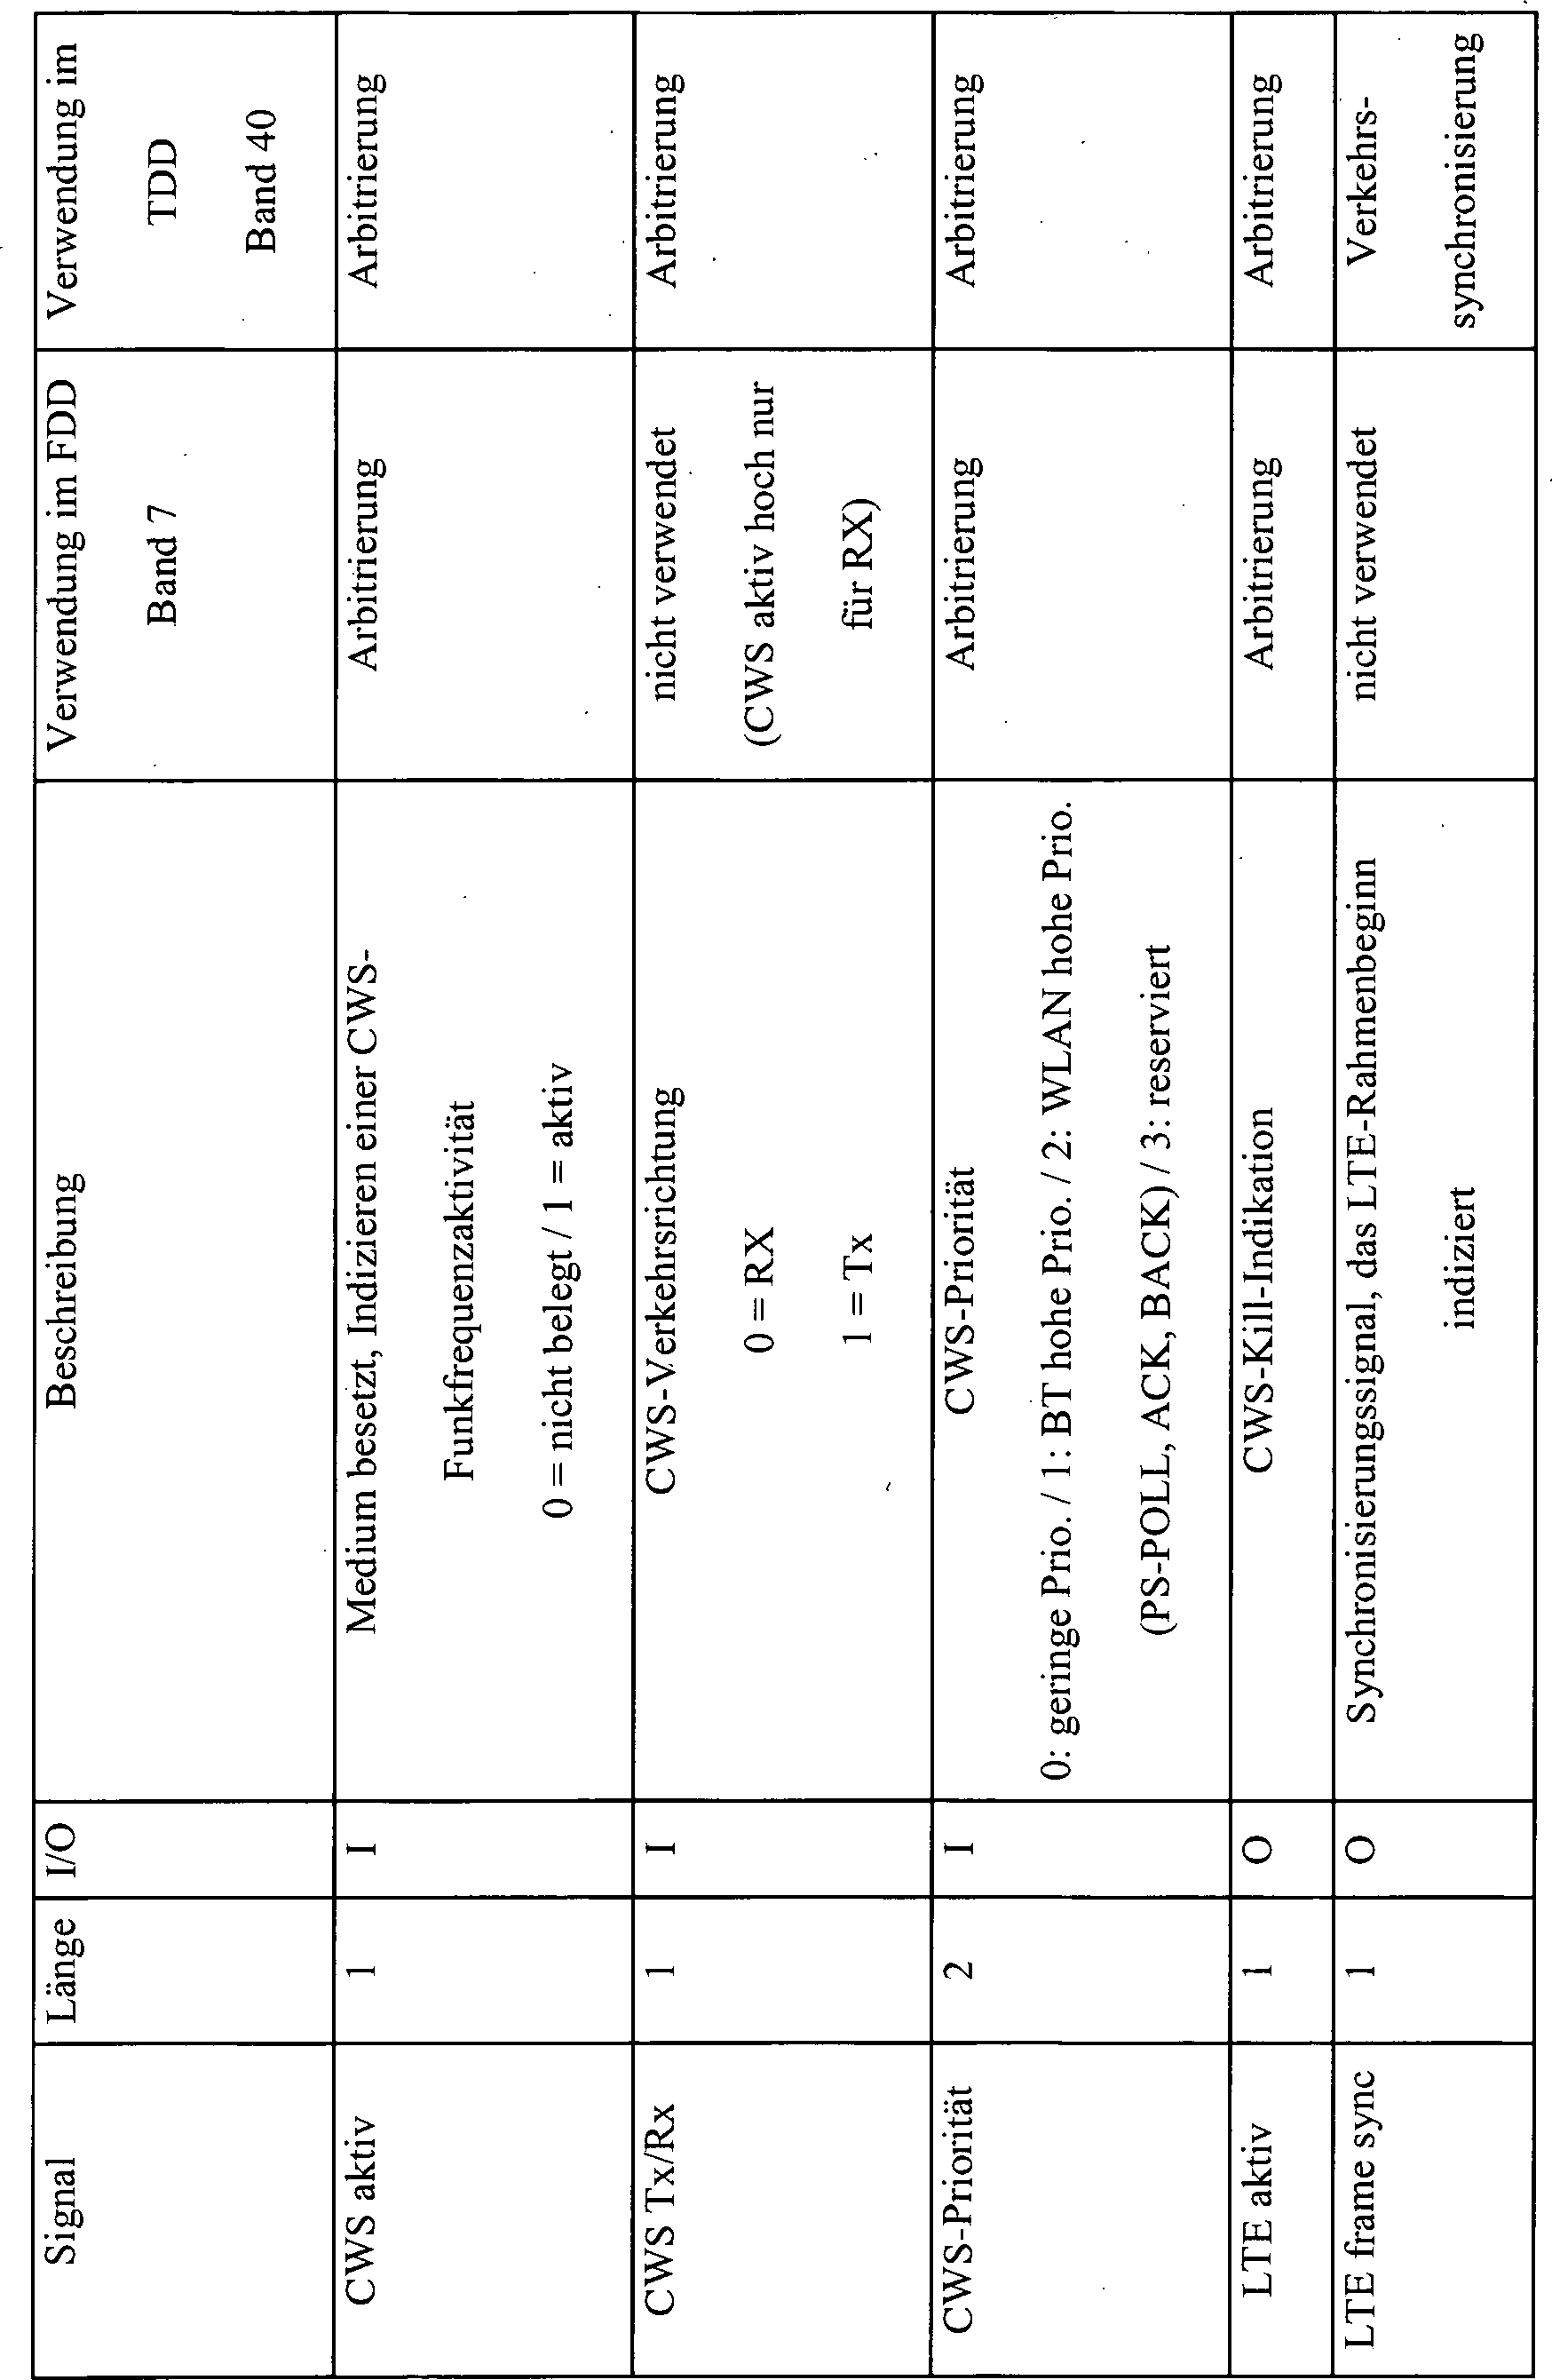 Fein Tdm Rahmenstruktur Bilder - Benutzerdefinierte Bilderrahmen ...